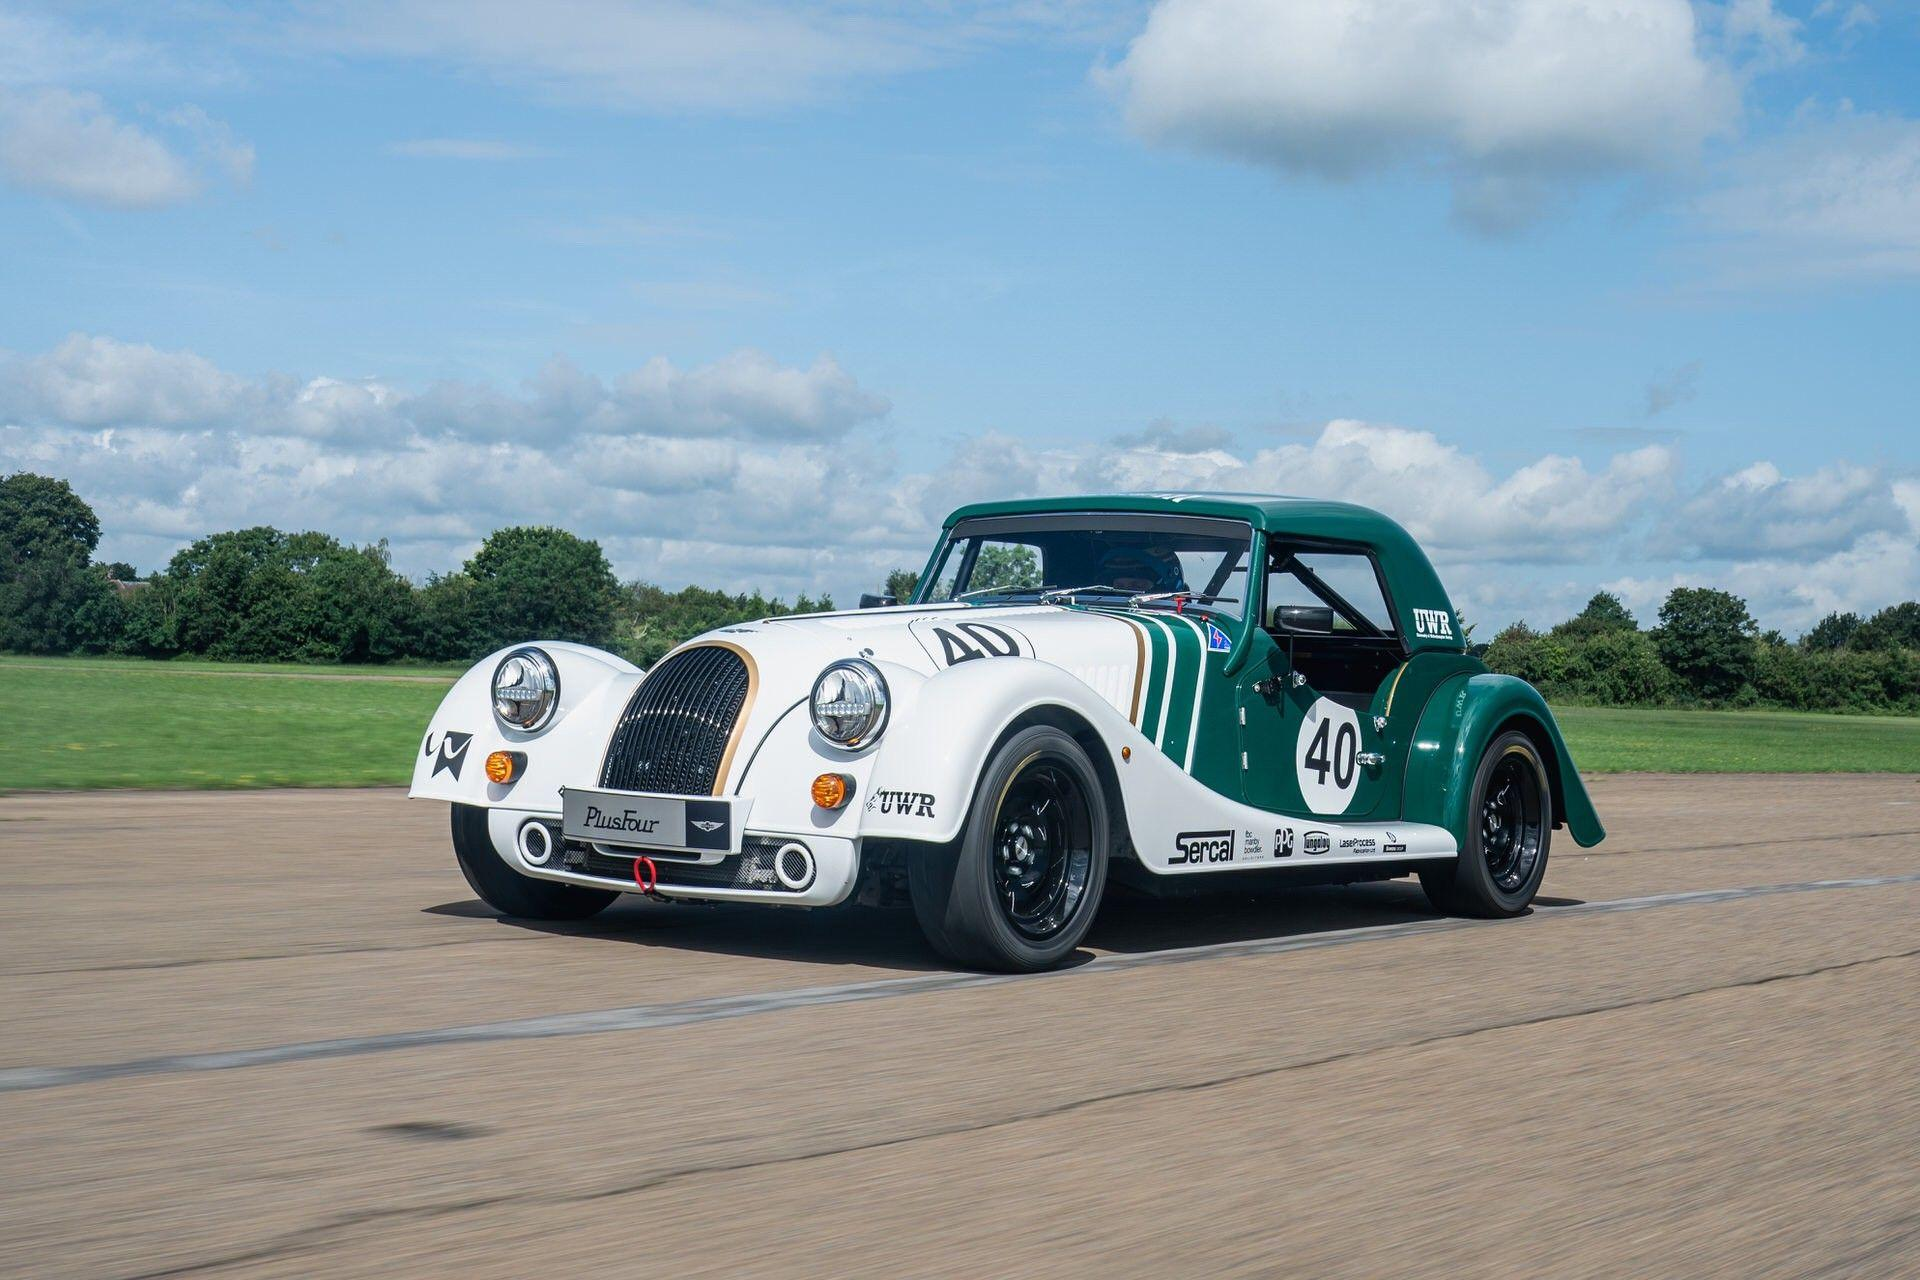 Morgan_Plus_Four_race_cars-0009